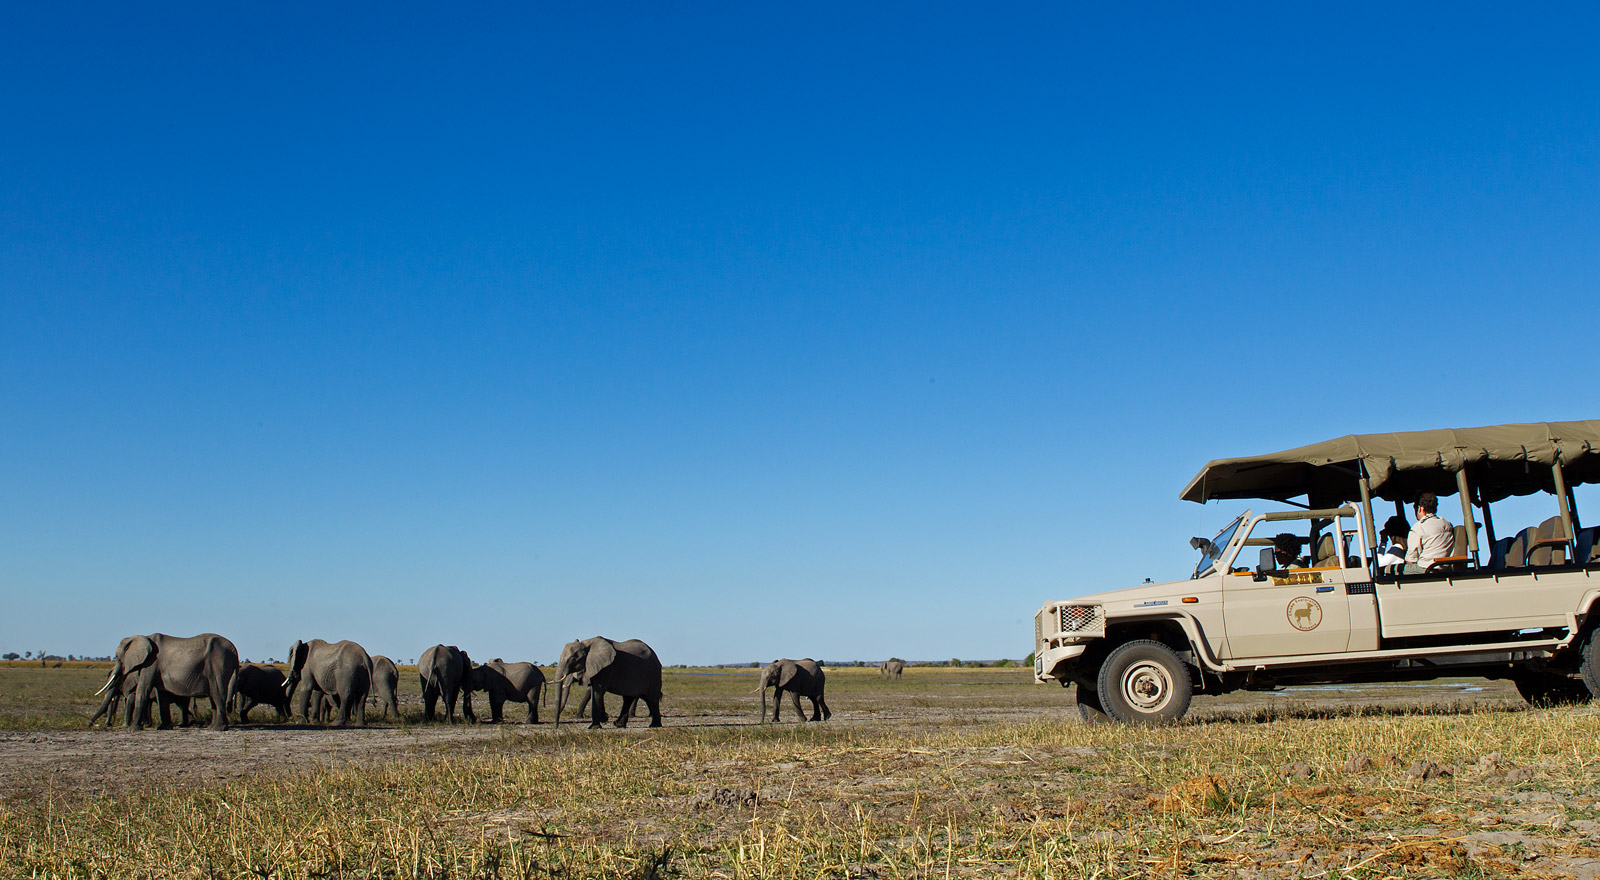 elephant-botswana-safari